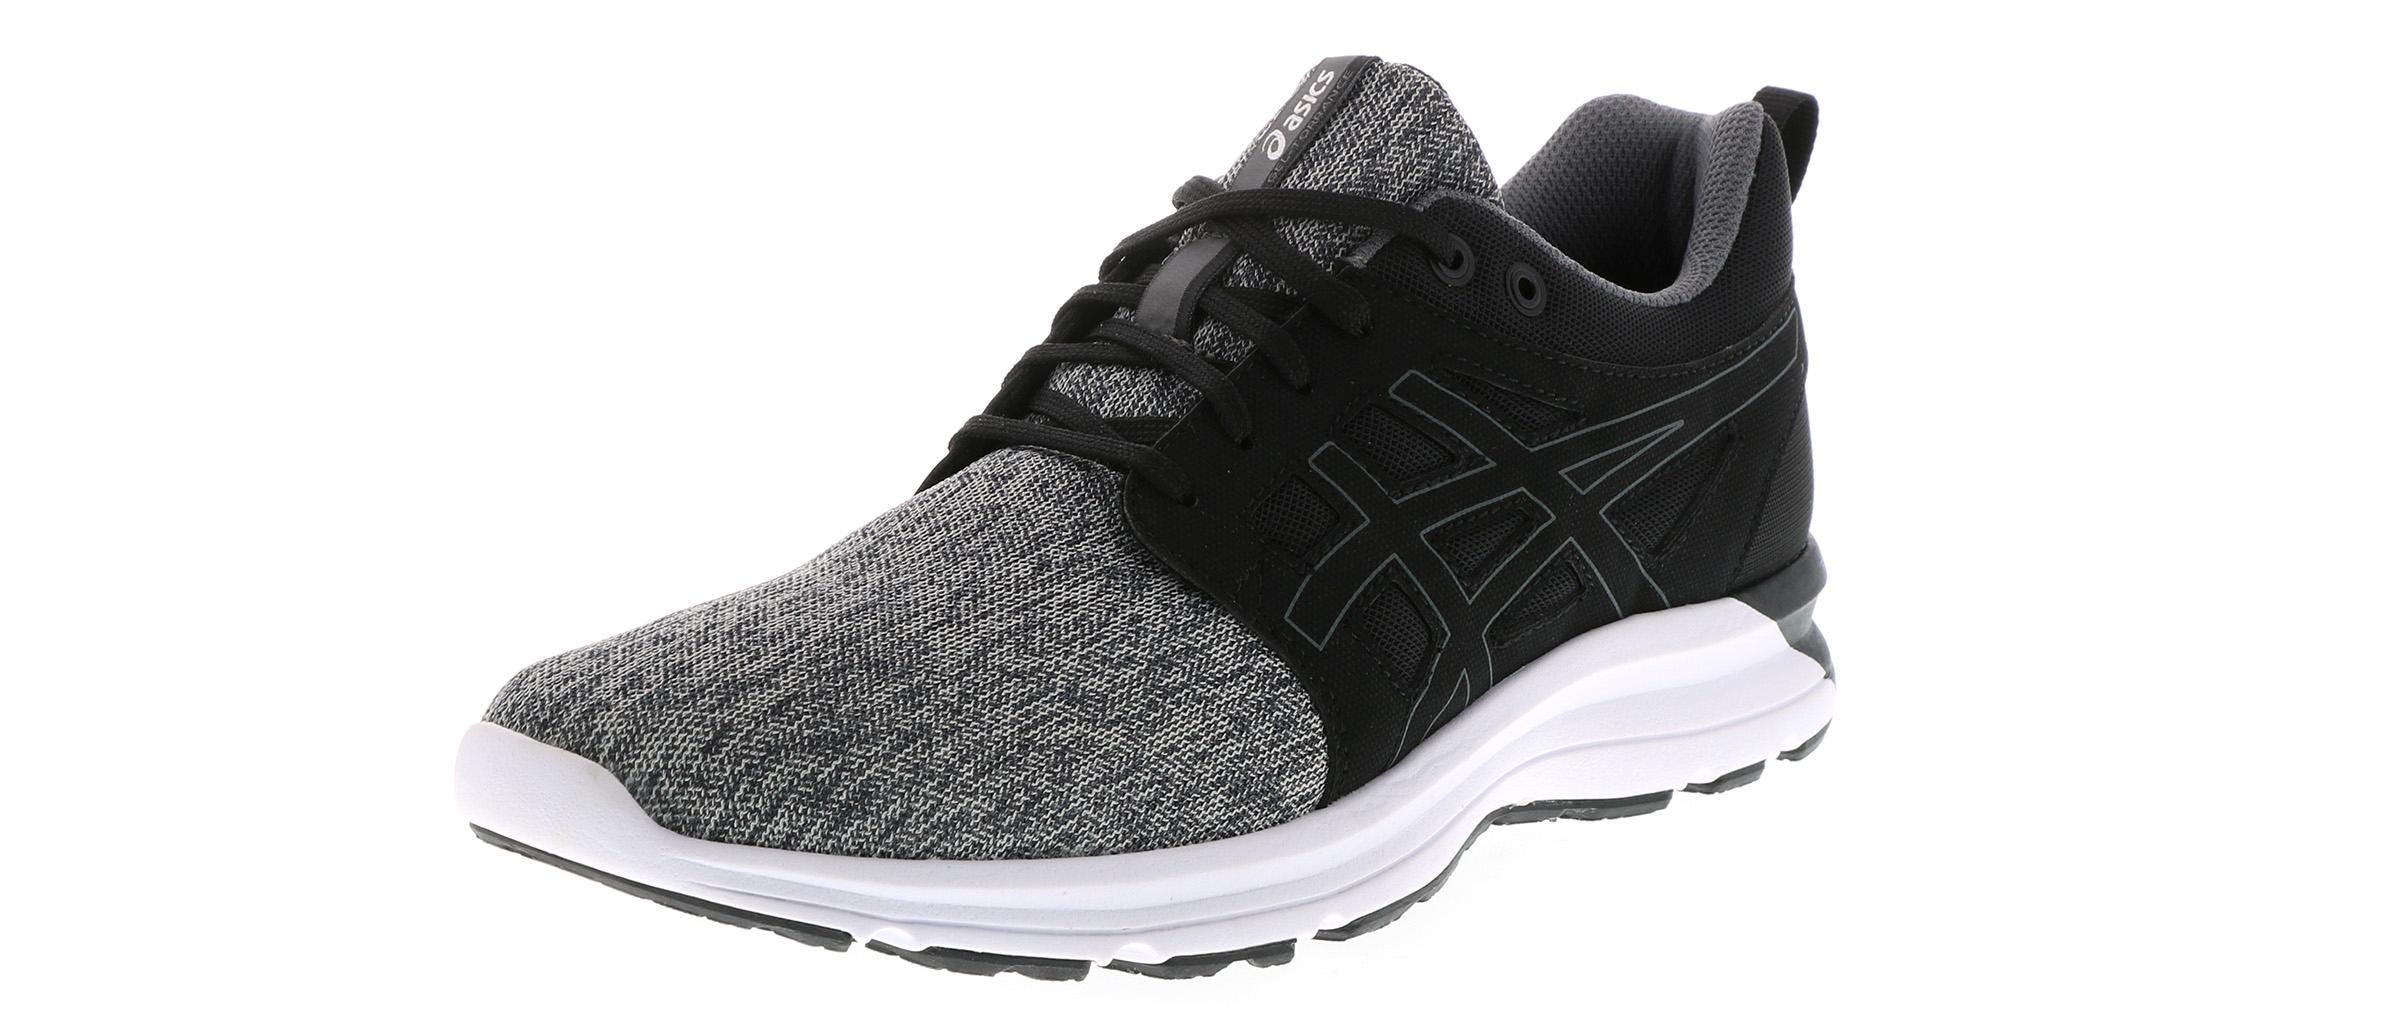 sports shoes b5cd8 676fb Men's Asics Gel Torrance Red | Shoe Sensation